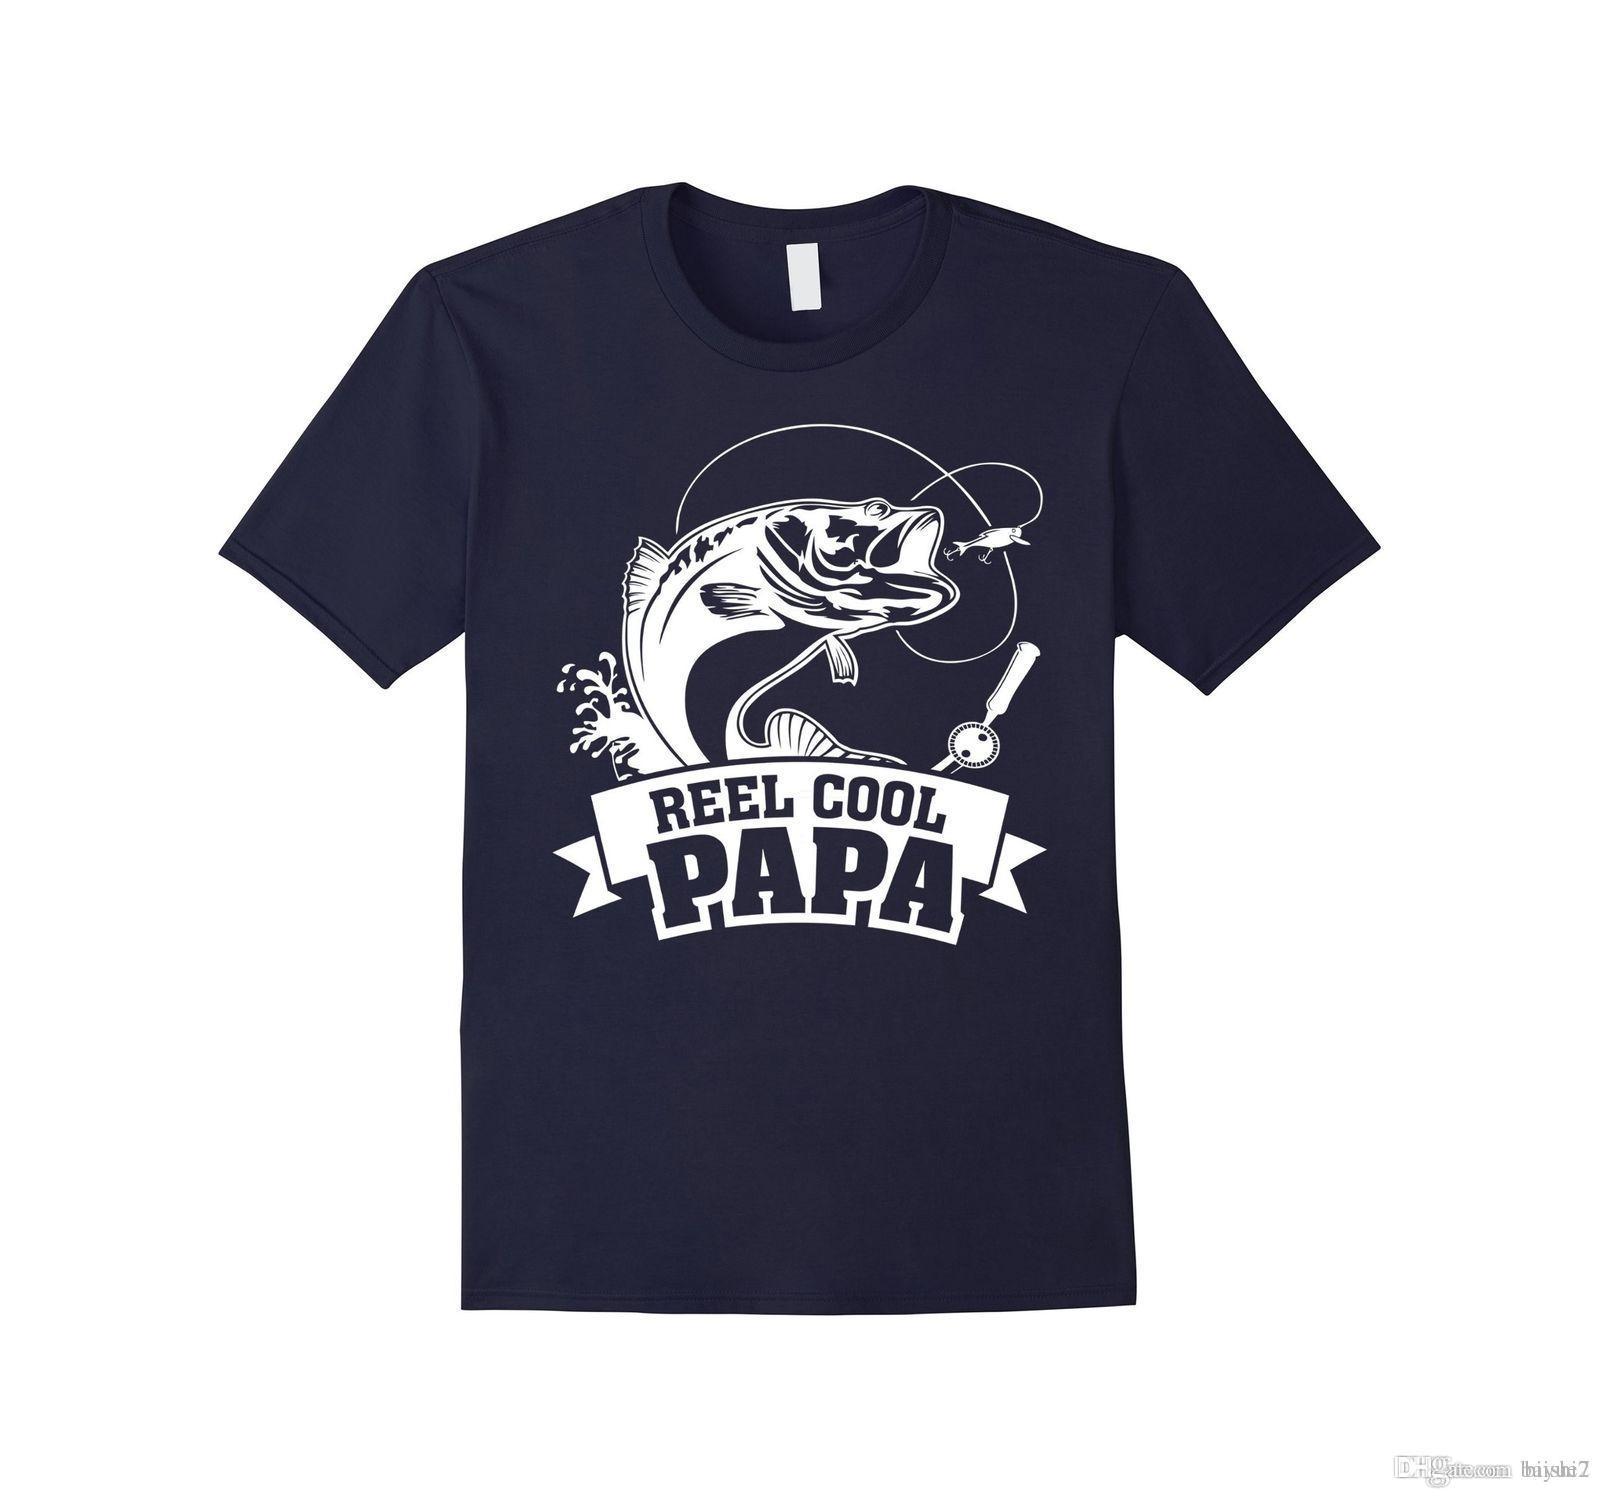 b2712466 Mens Reel Cool Papa Fishing Grandpa Father's Day Gift T-Shirt XL Navy  Fashion Men T Shirts Free Shipping